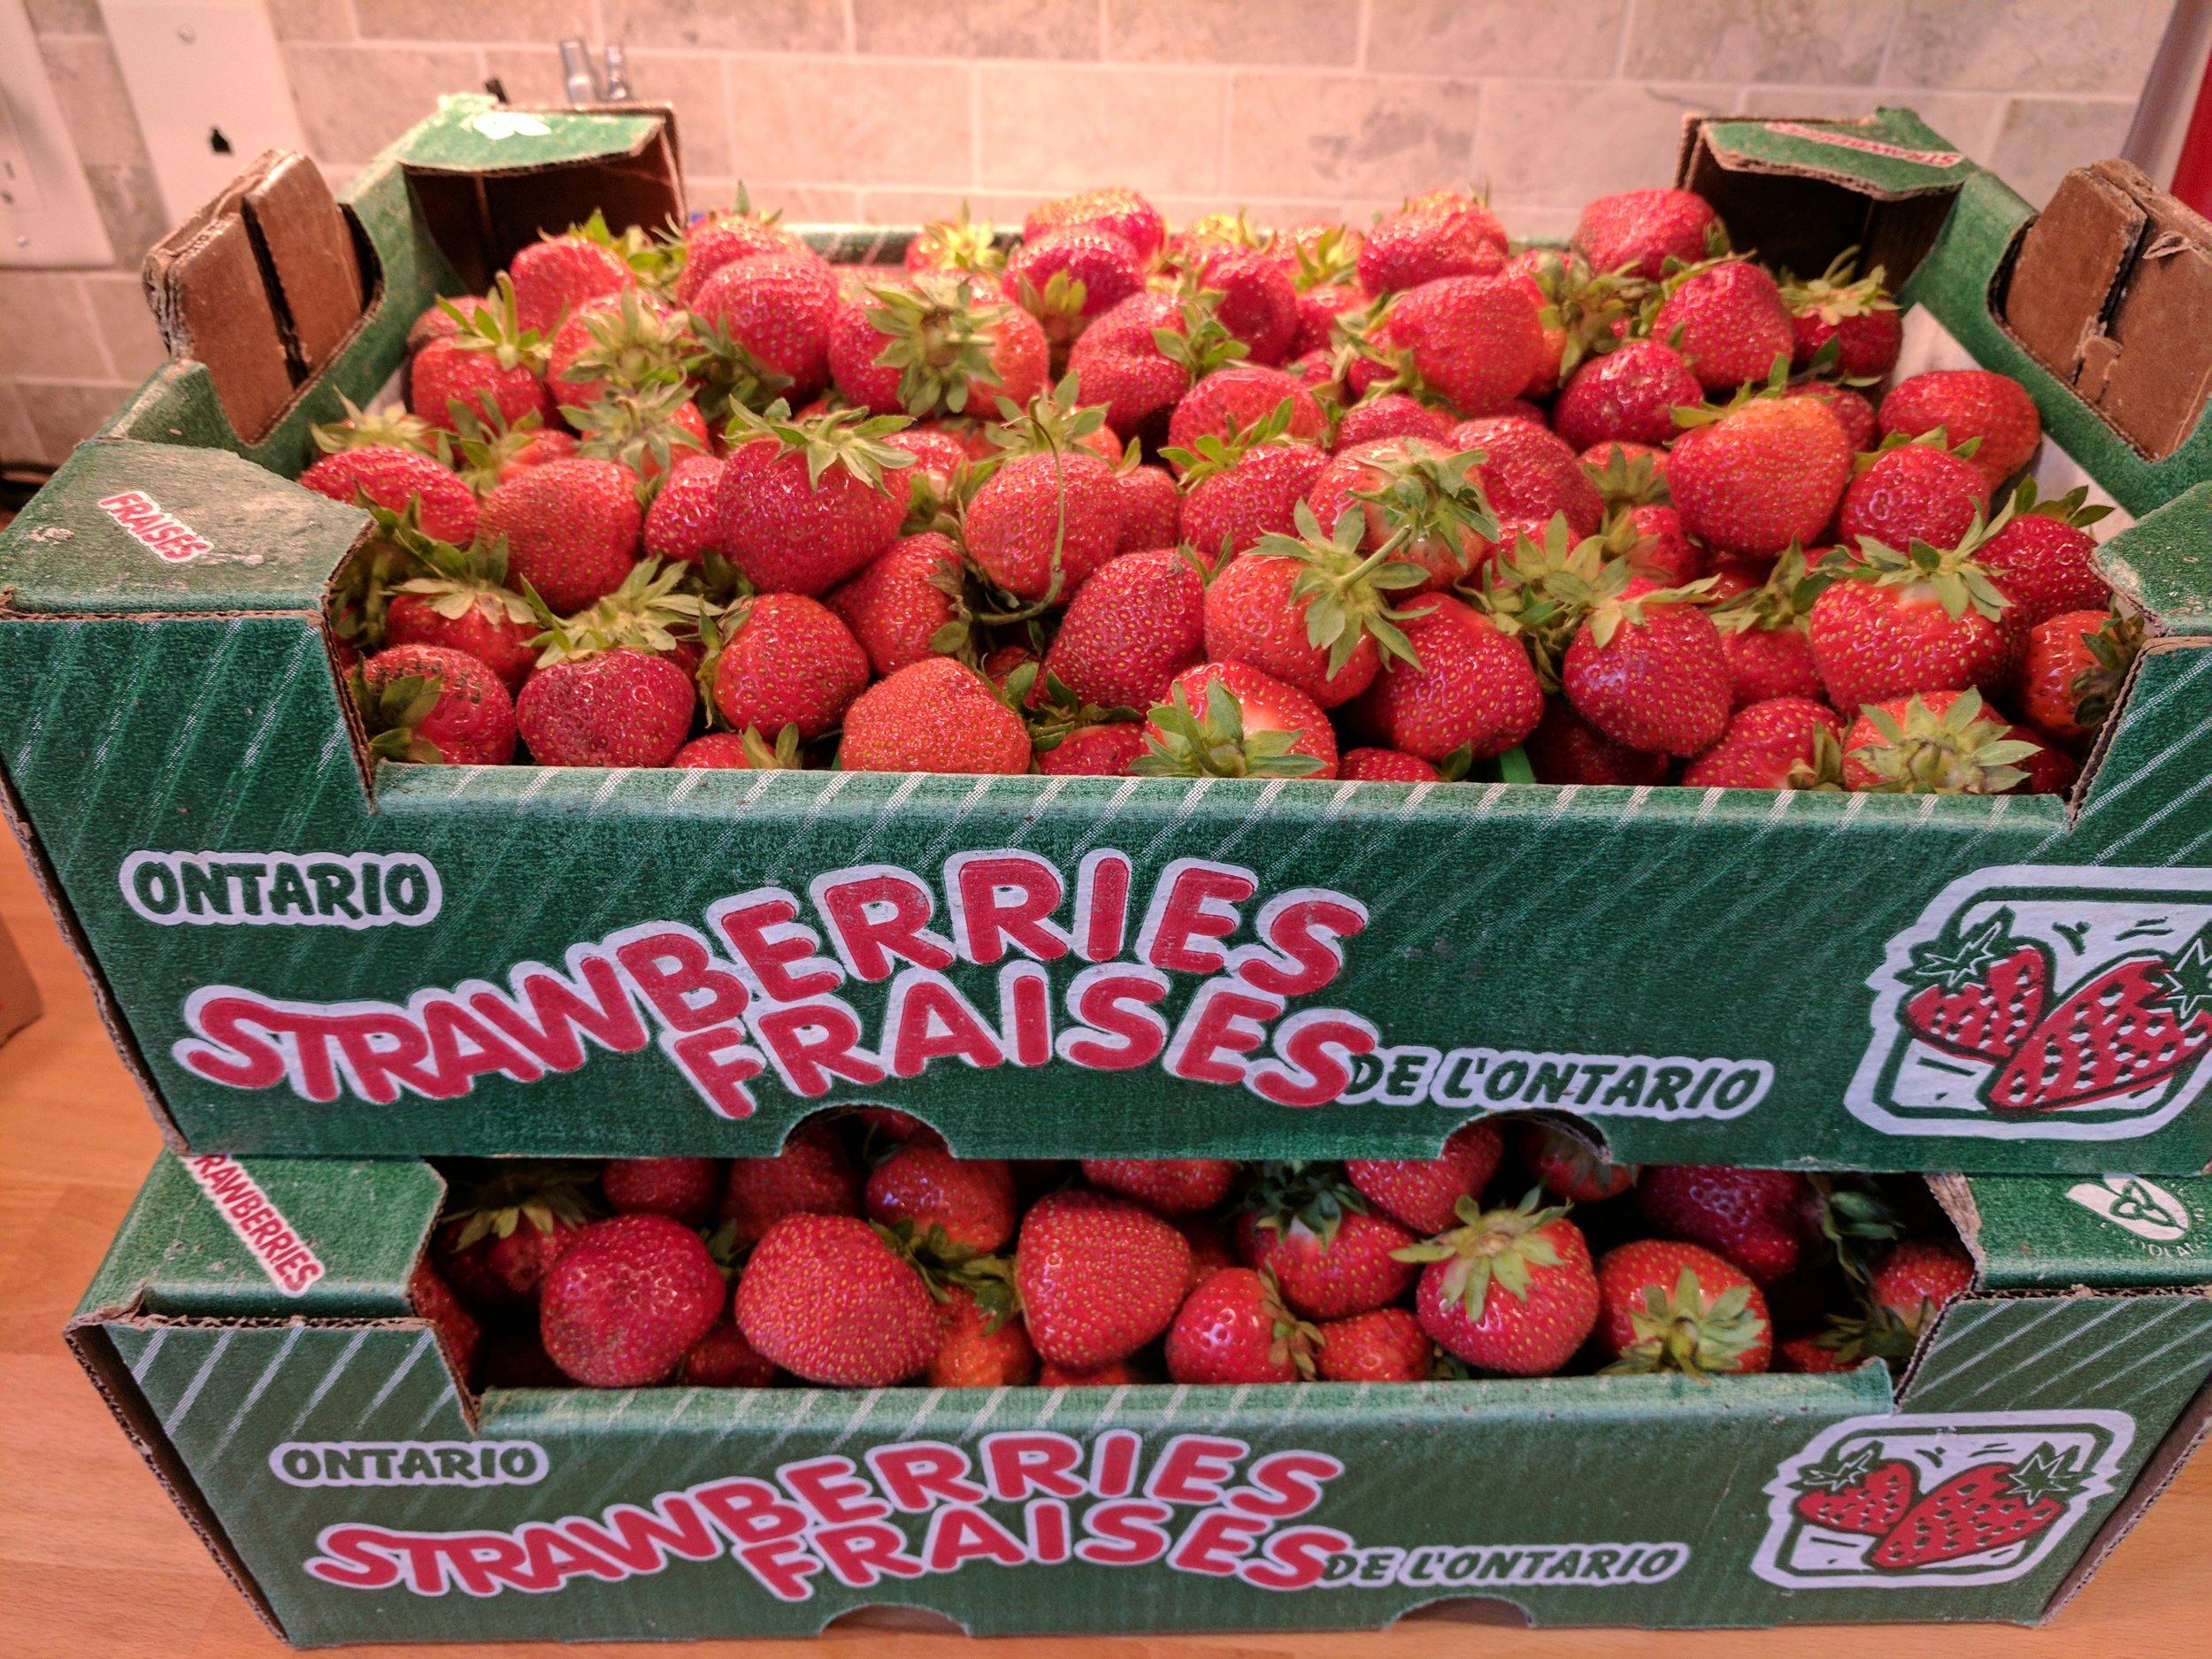 A berry nice haul...